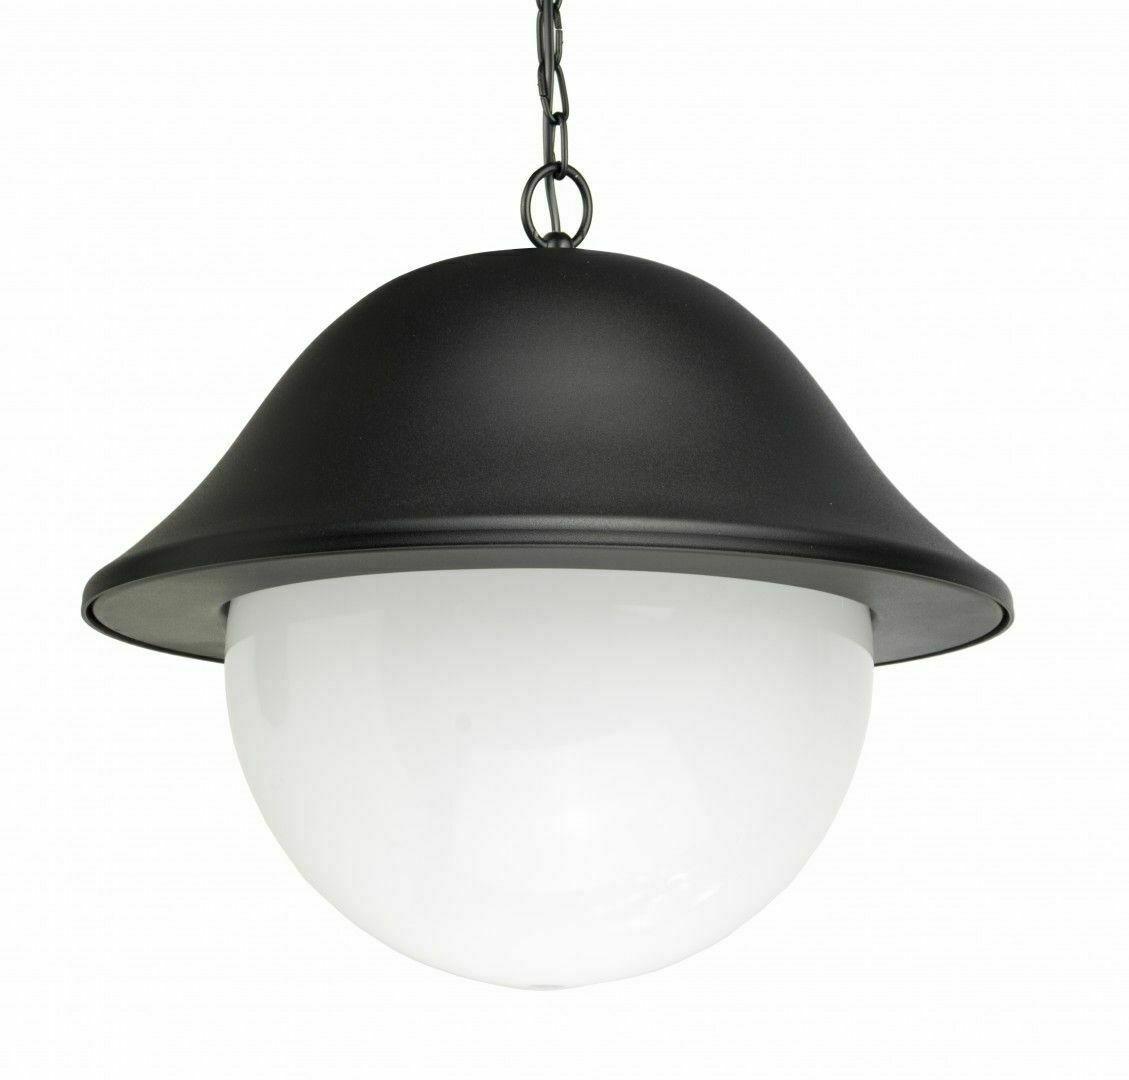 Prince Max K 1018/1 / O-BD hanging lamp